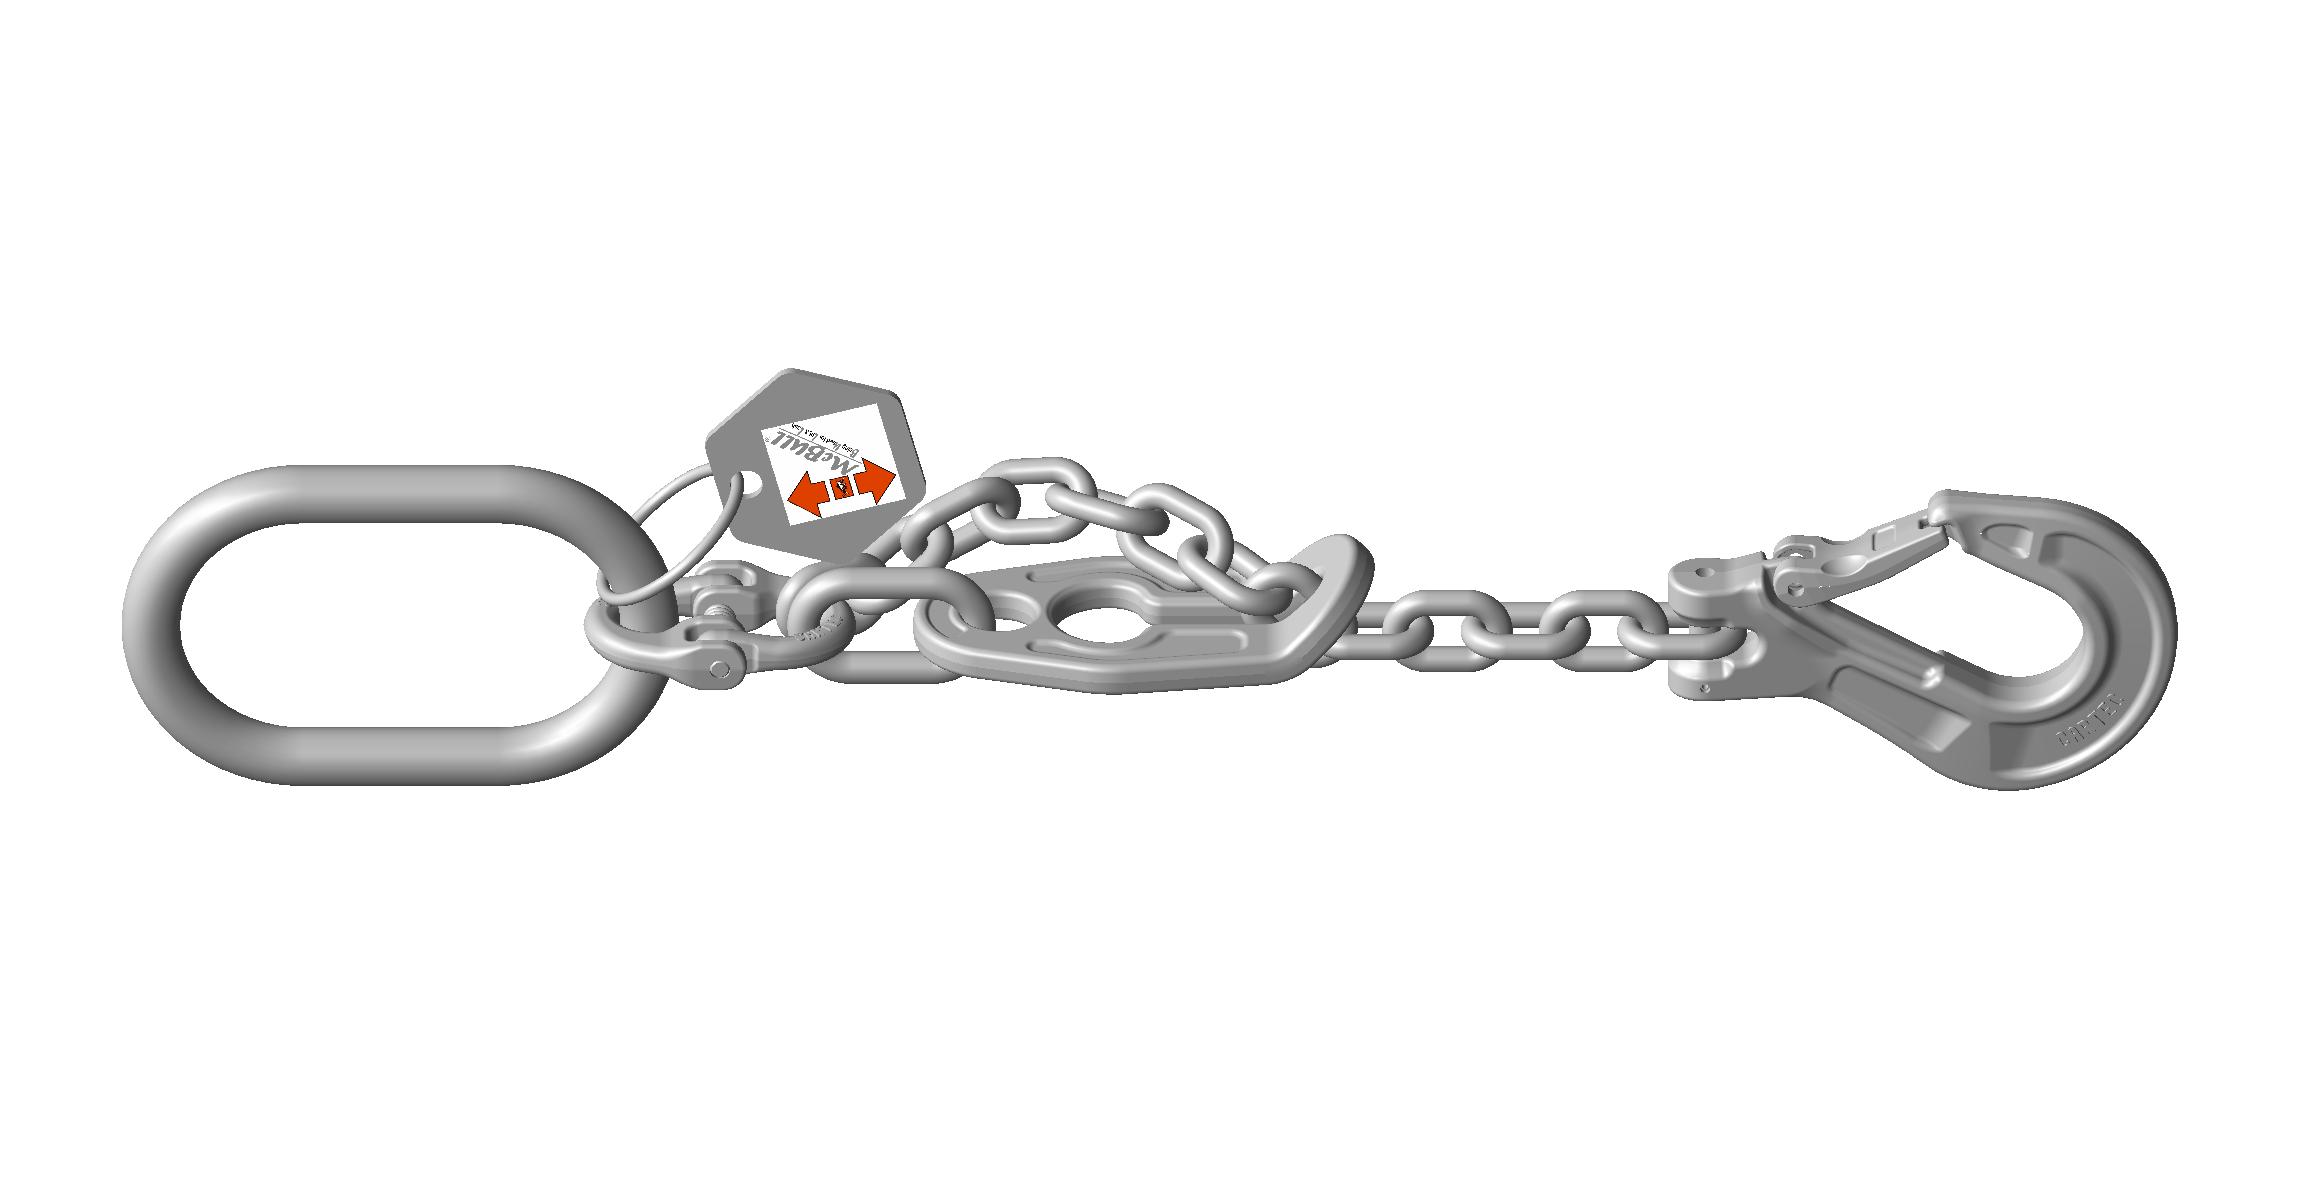 INOX Einstrang-Kettengehänge